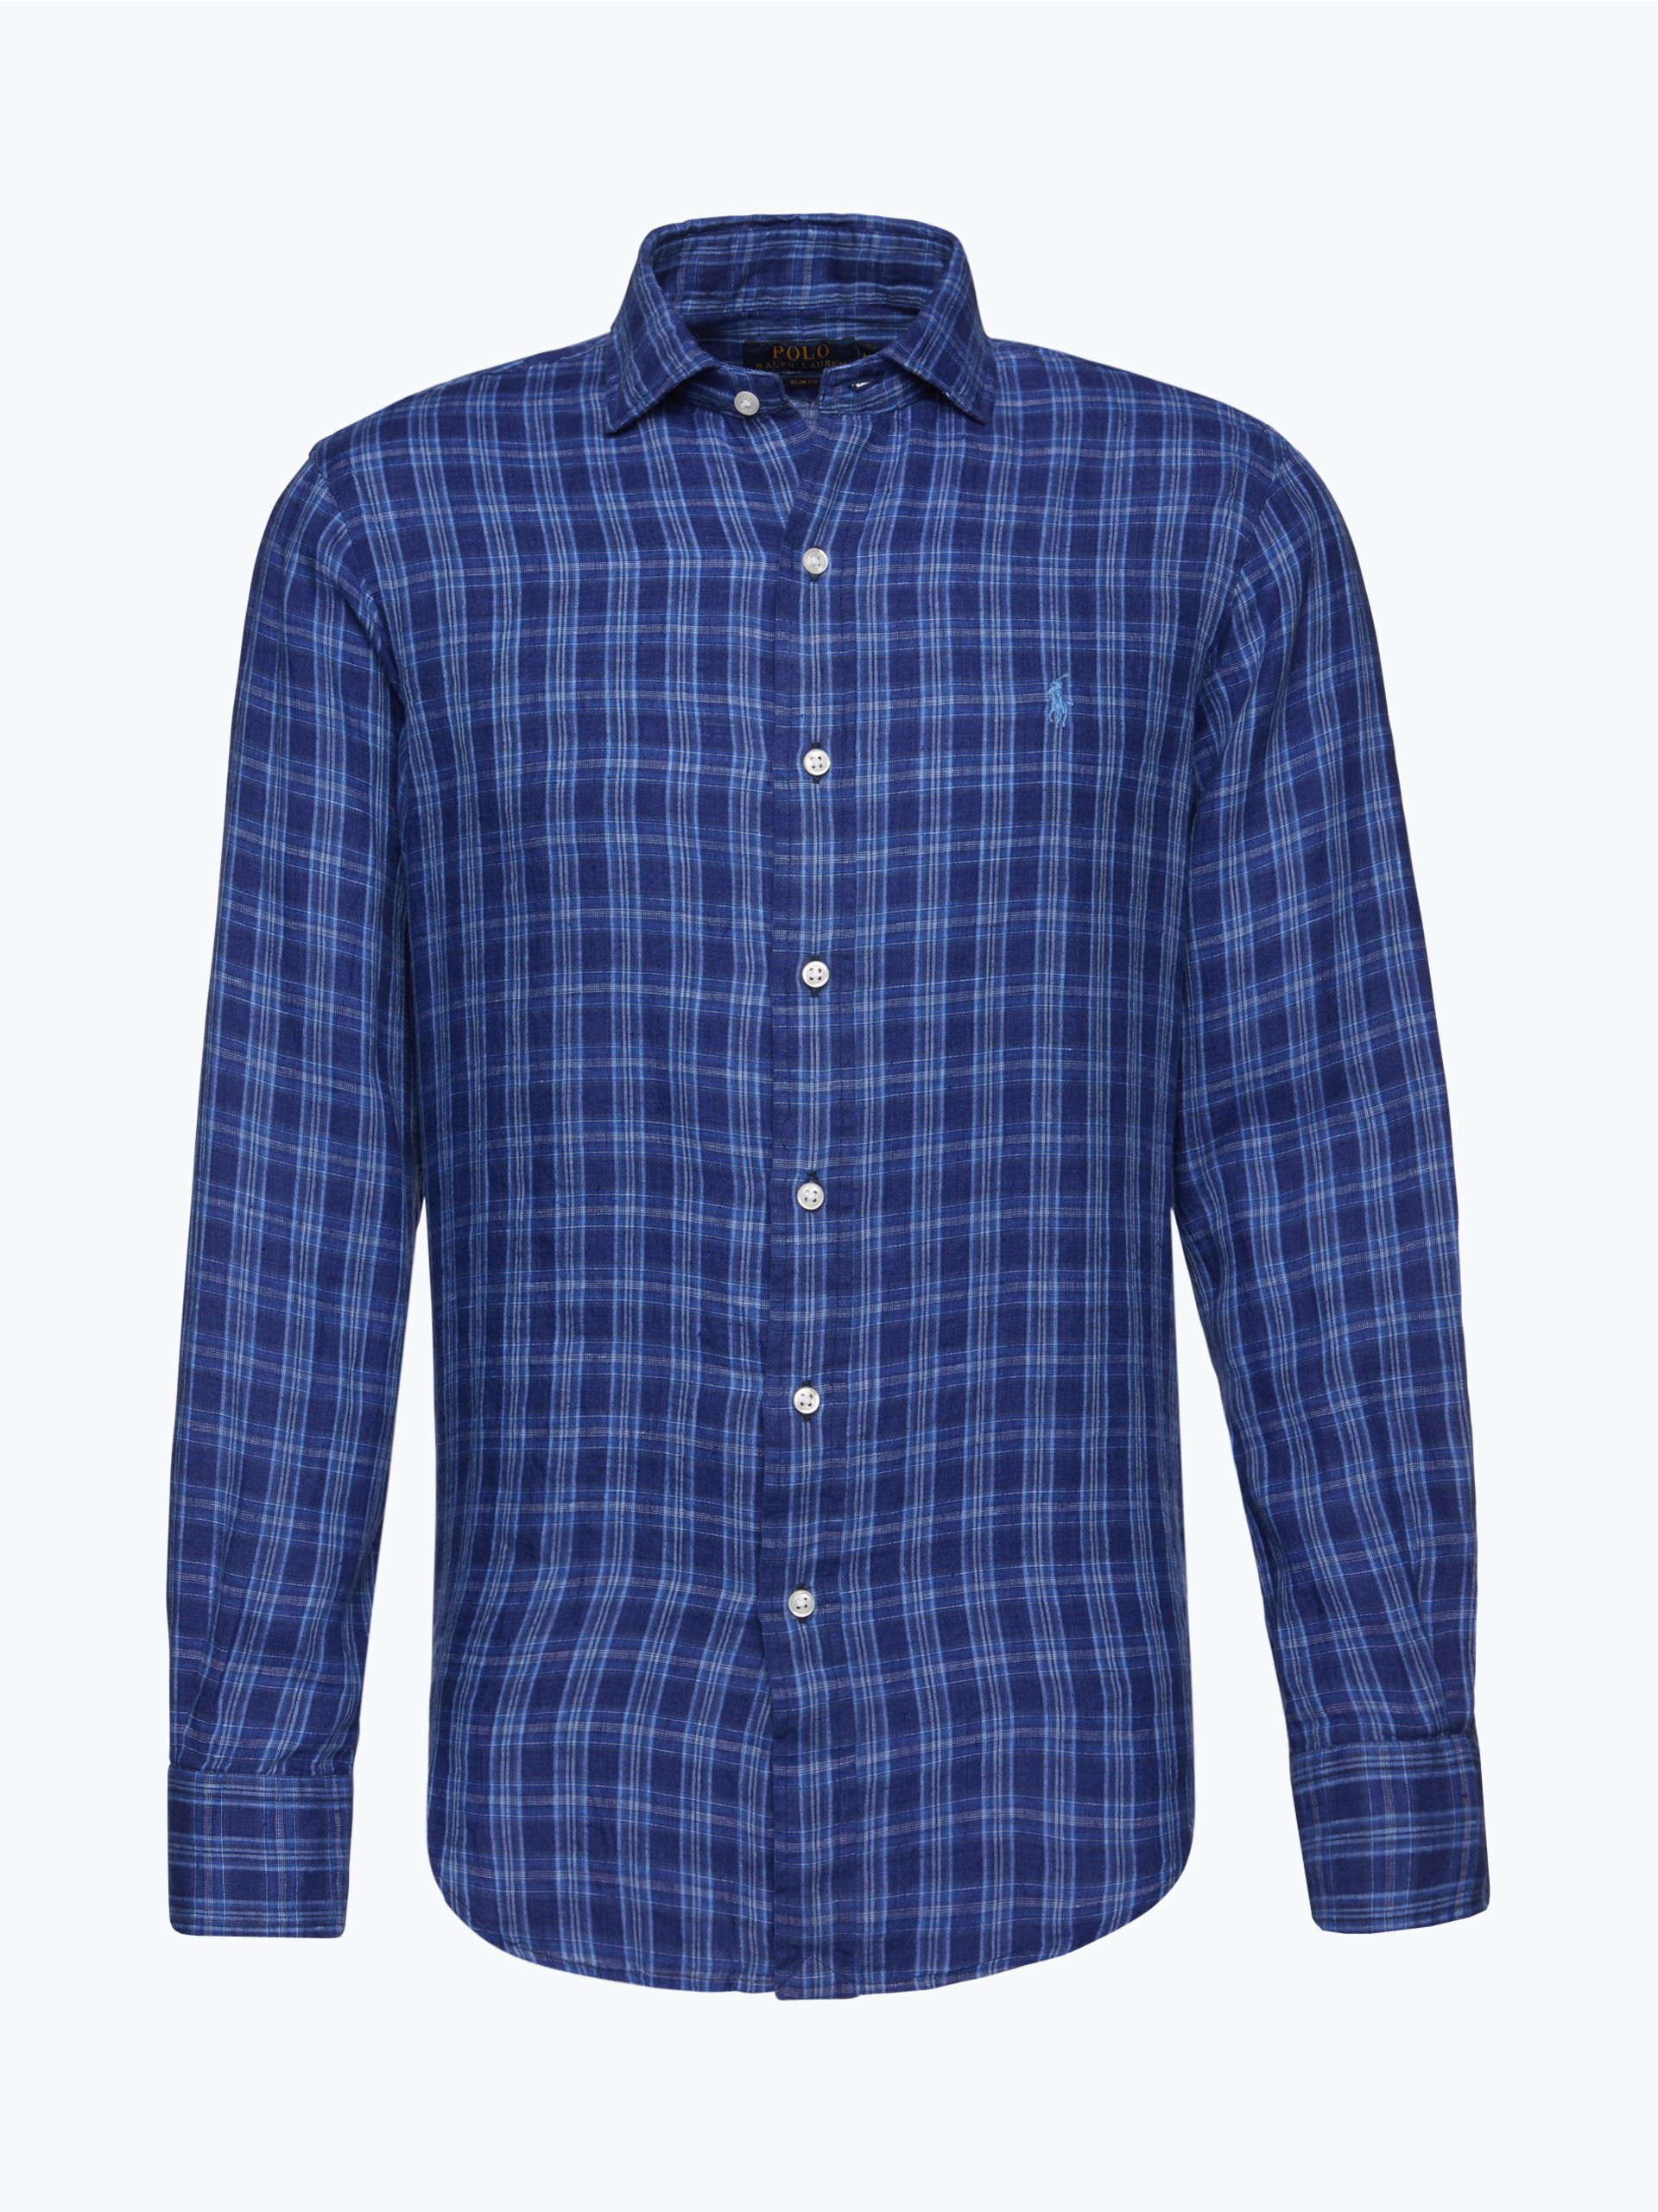 polo ralph lauren herren hemd aus leinen blau kariert online kaufen vangraaf com. Black Bedroom Furniture Sets. Home Design Ideas